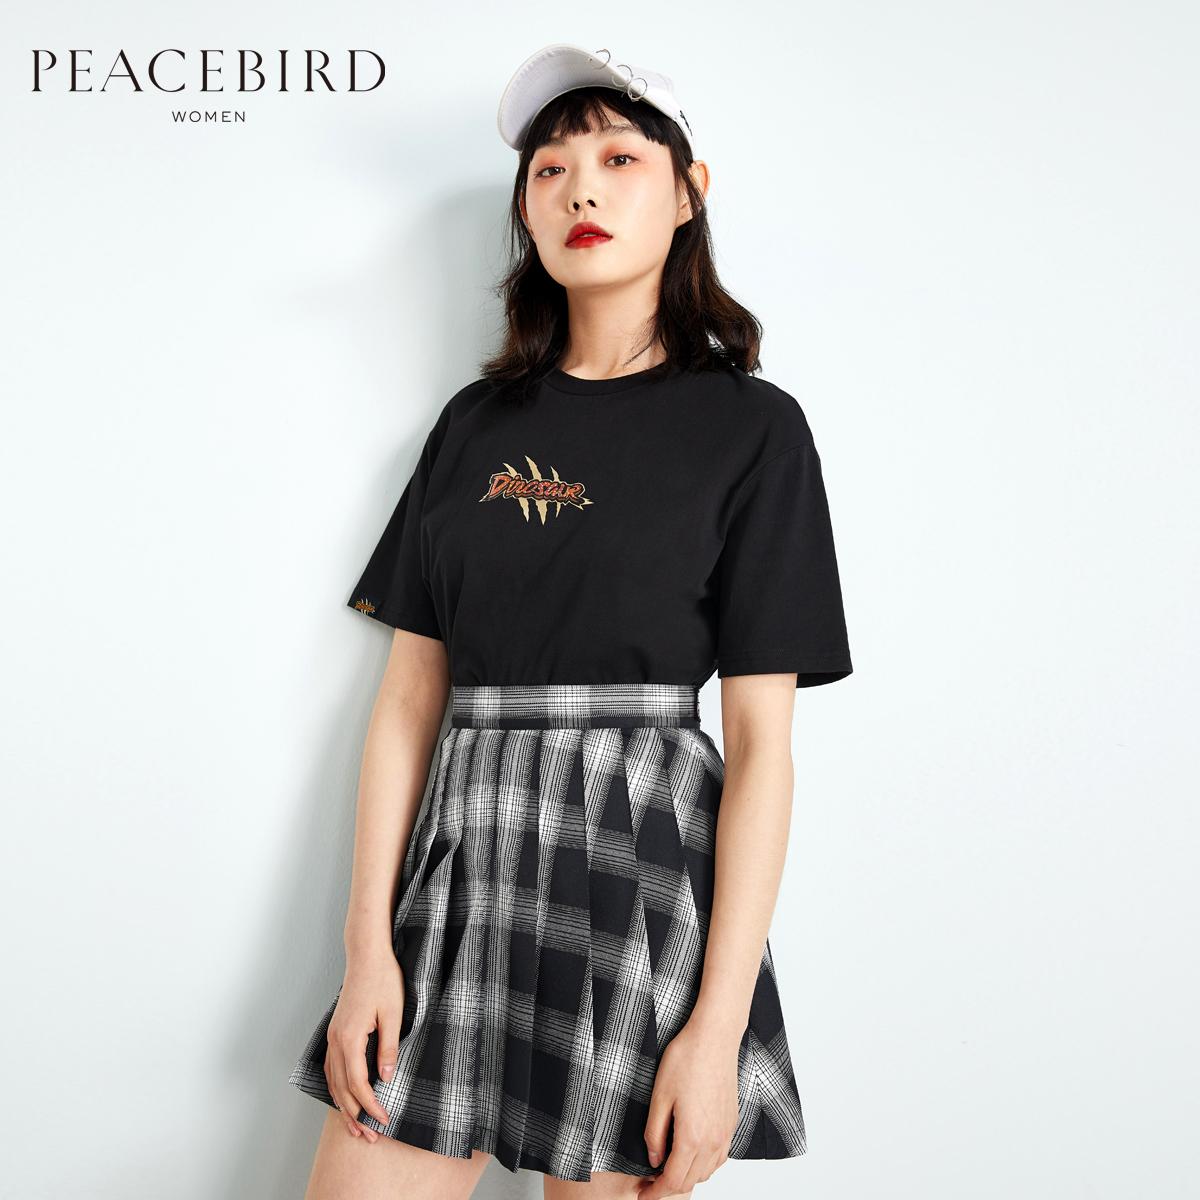 PEACEBIRD 太平鸟 AWGE81504 女士半身裙